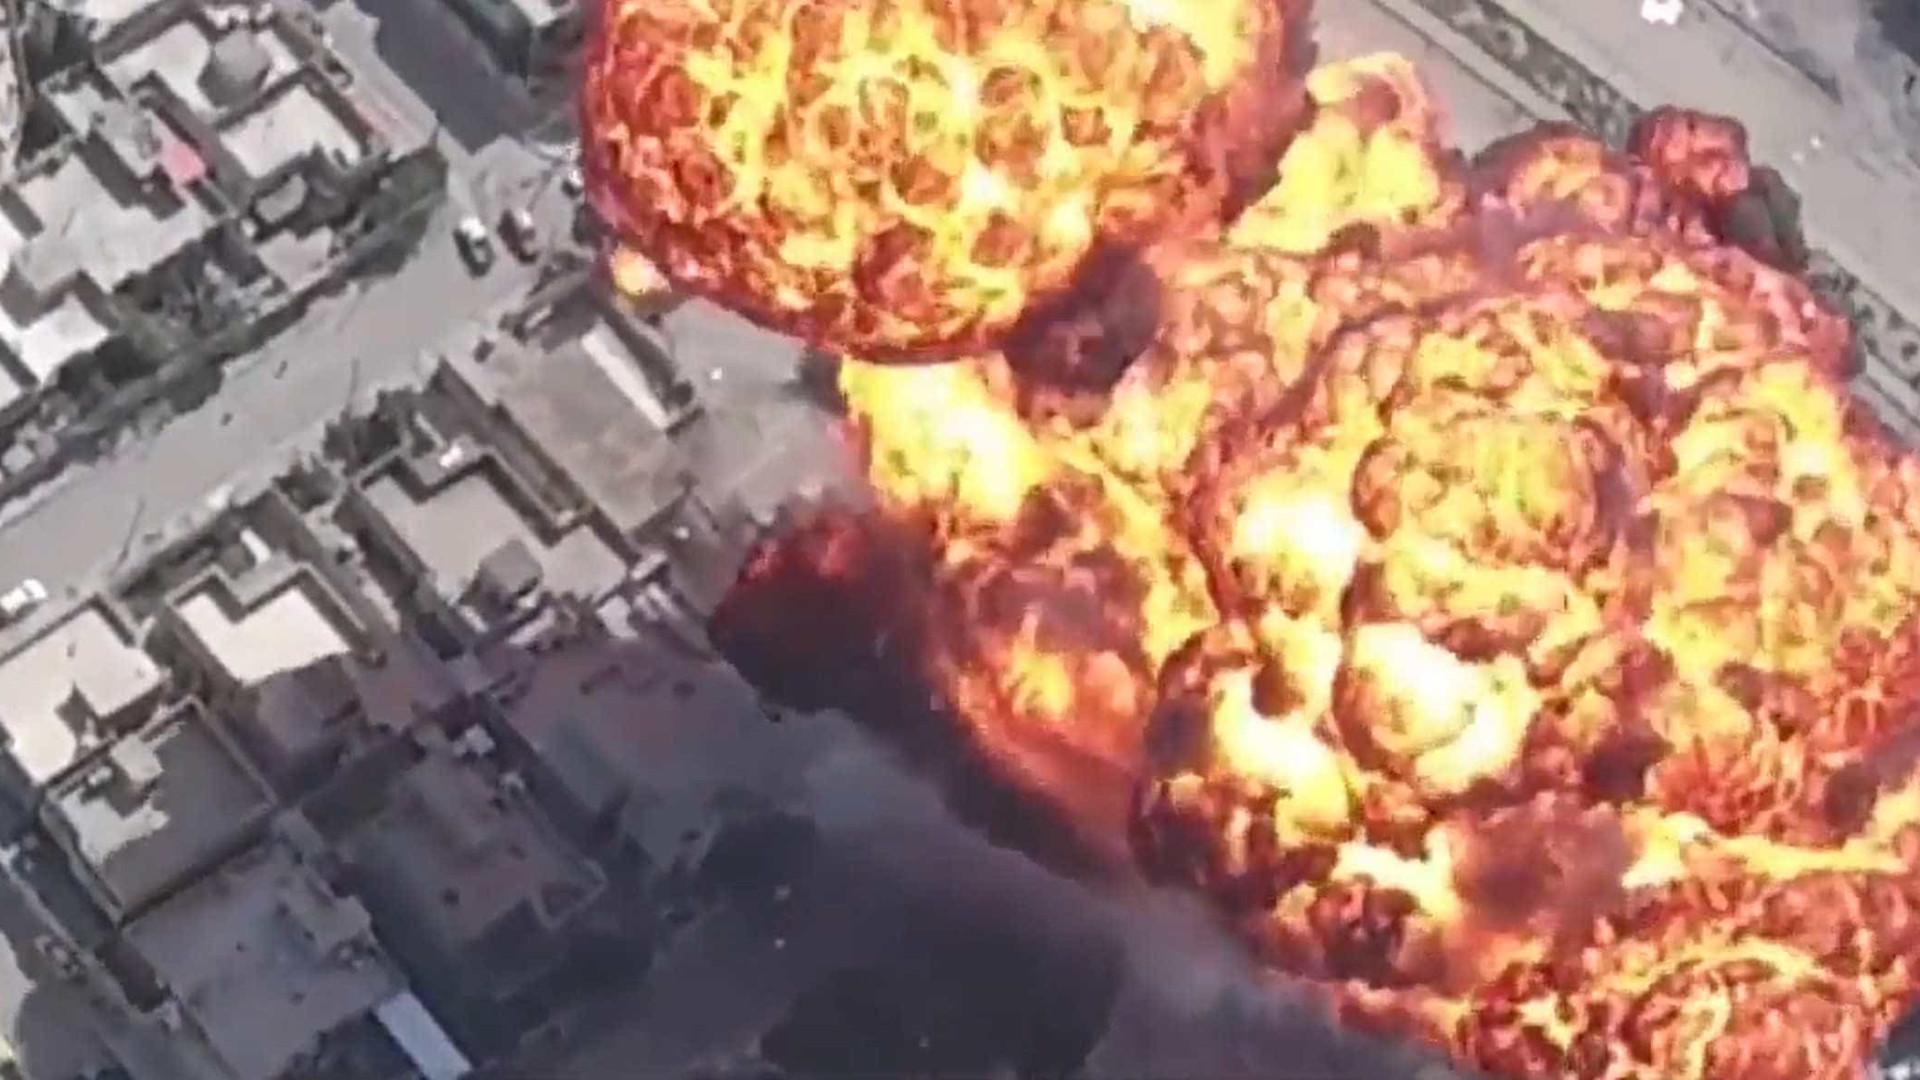 Iraque: Drone filma ataque do ISIS com carros-bomba